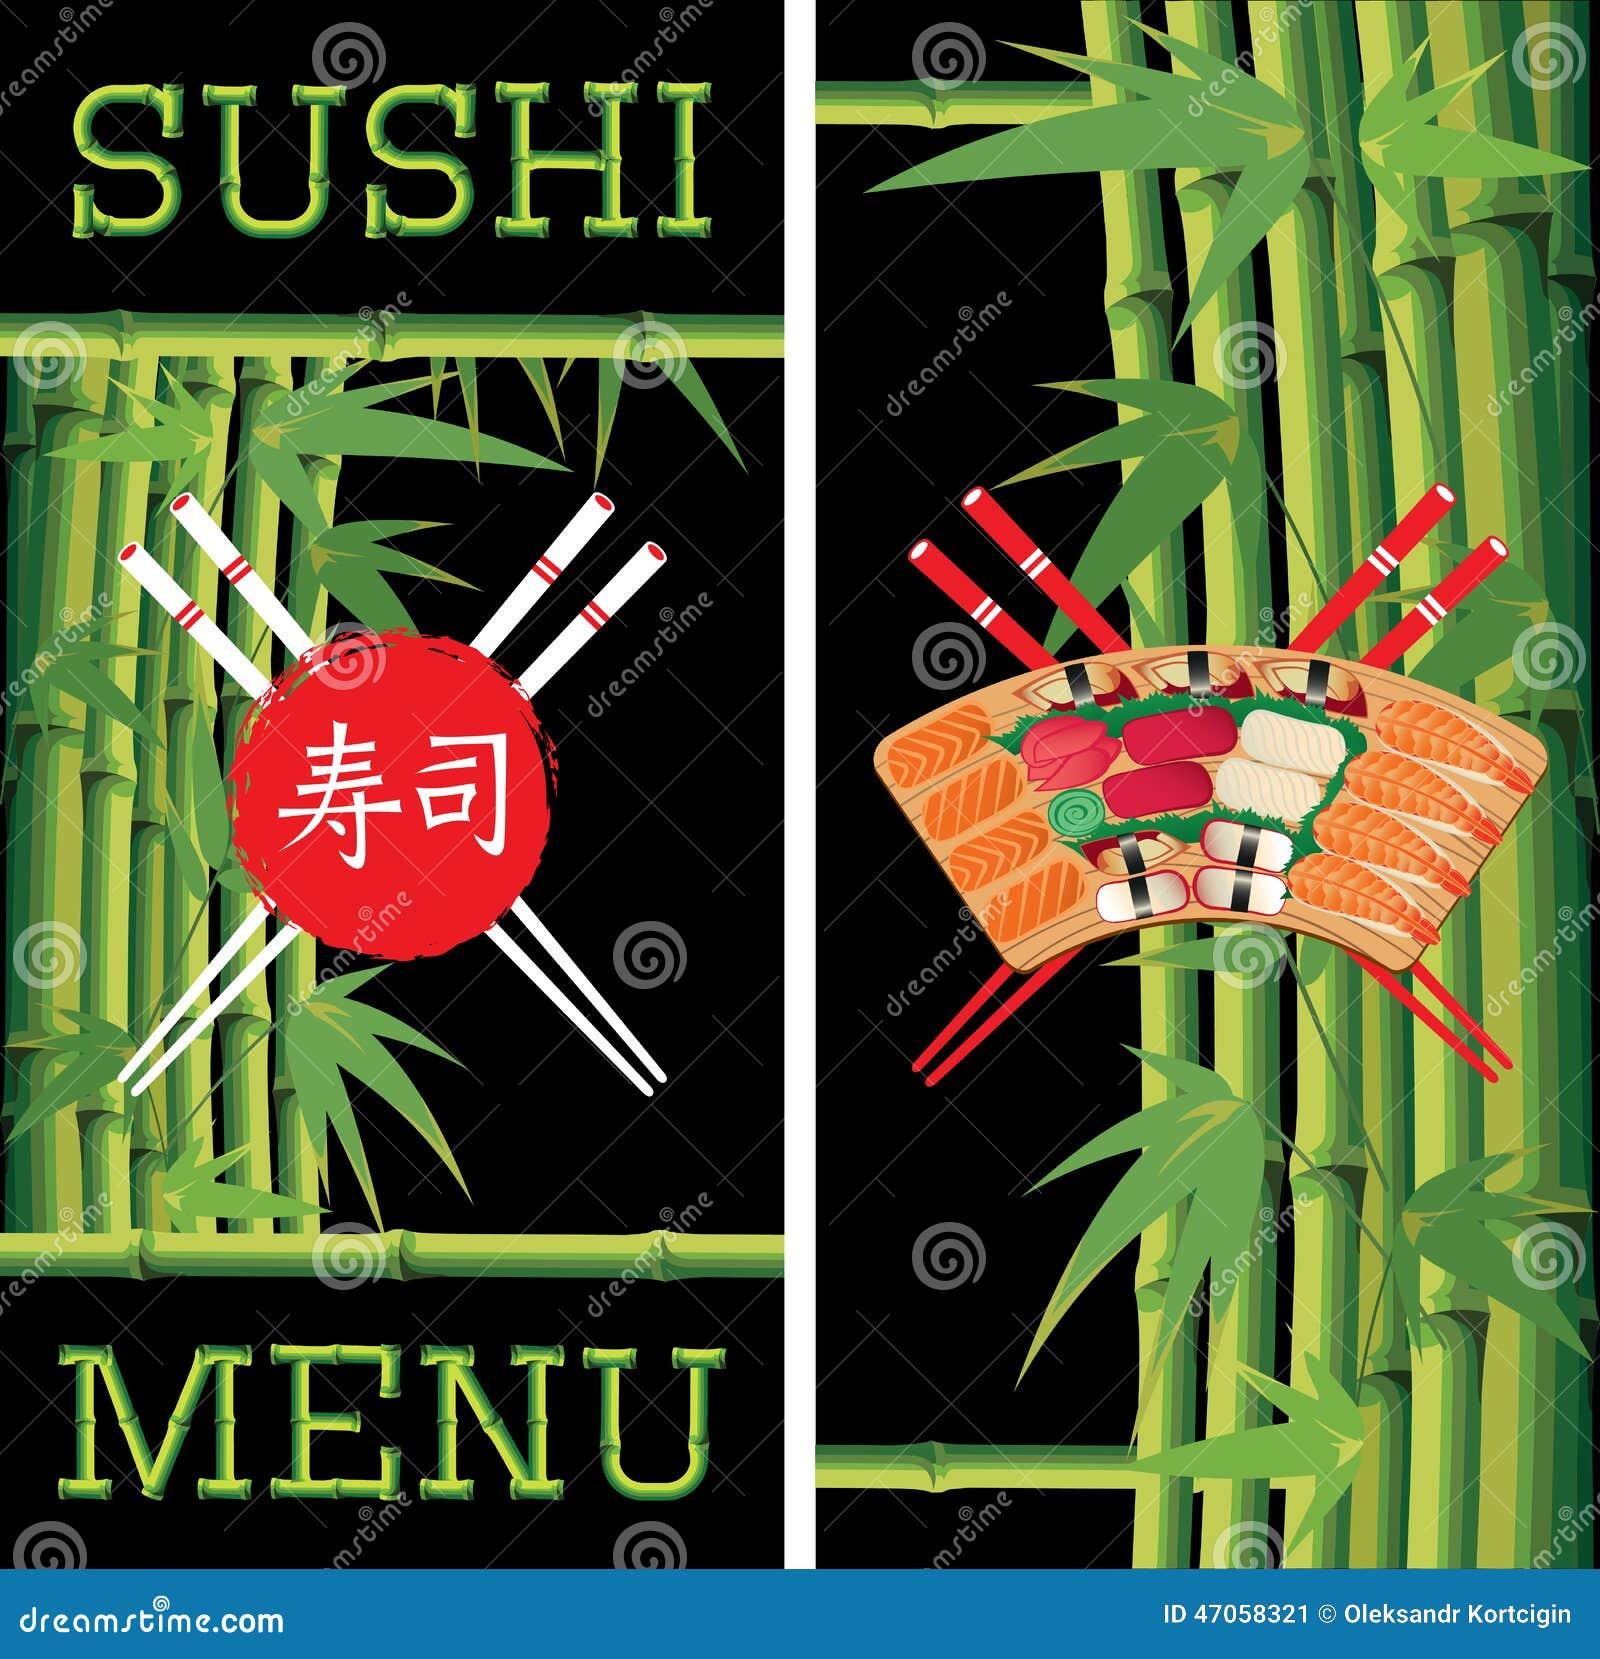 Фон для суши